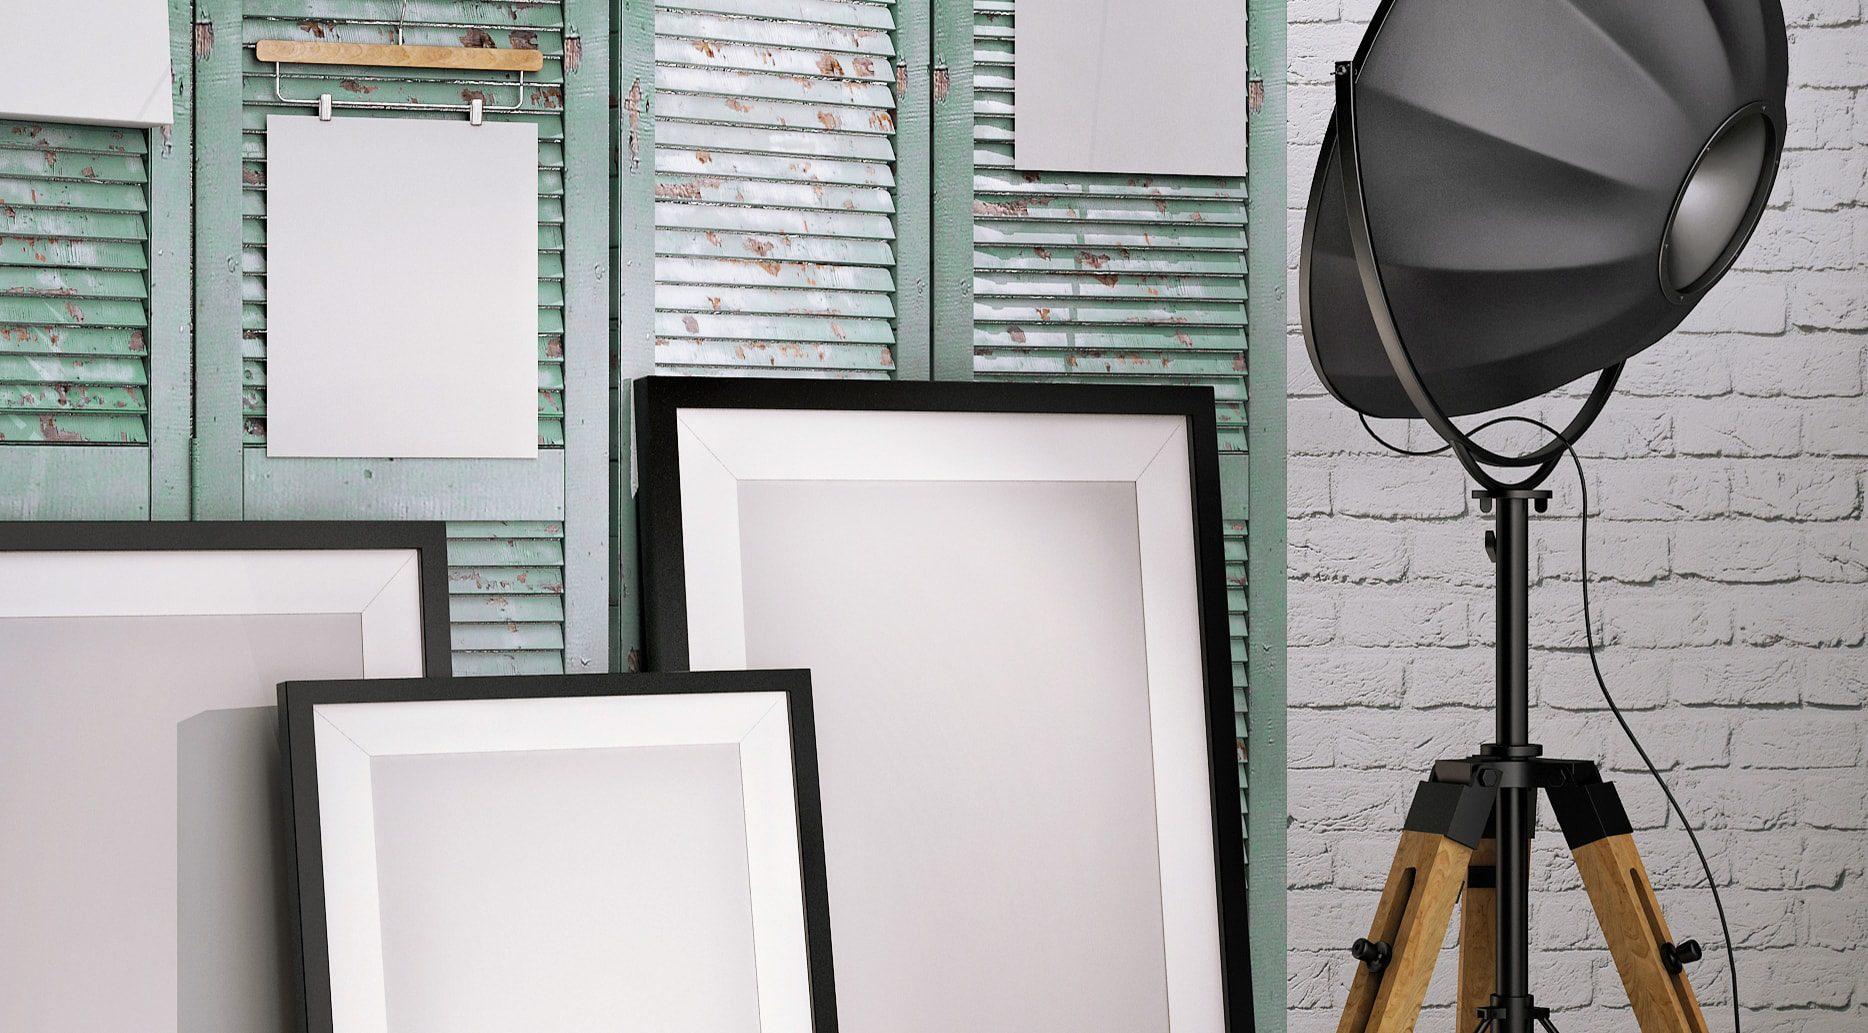 readymade-framing-img